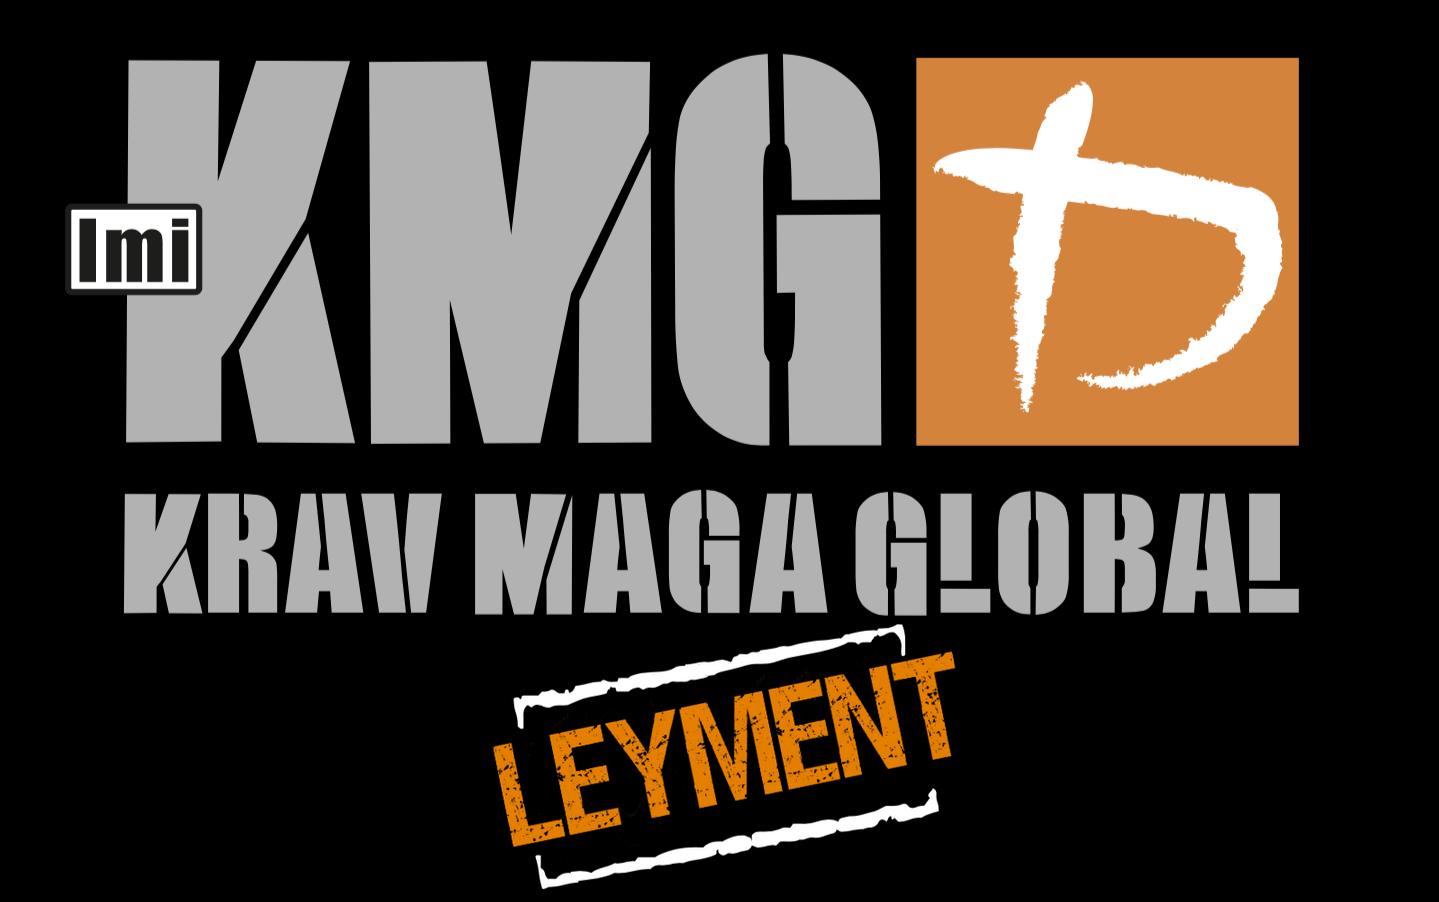 LogoKMG LEYMENT3.png